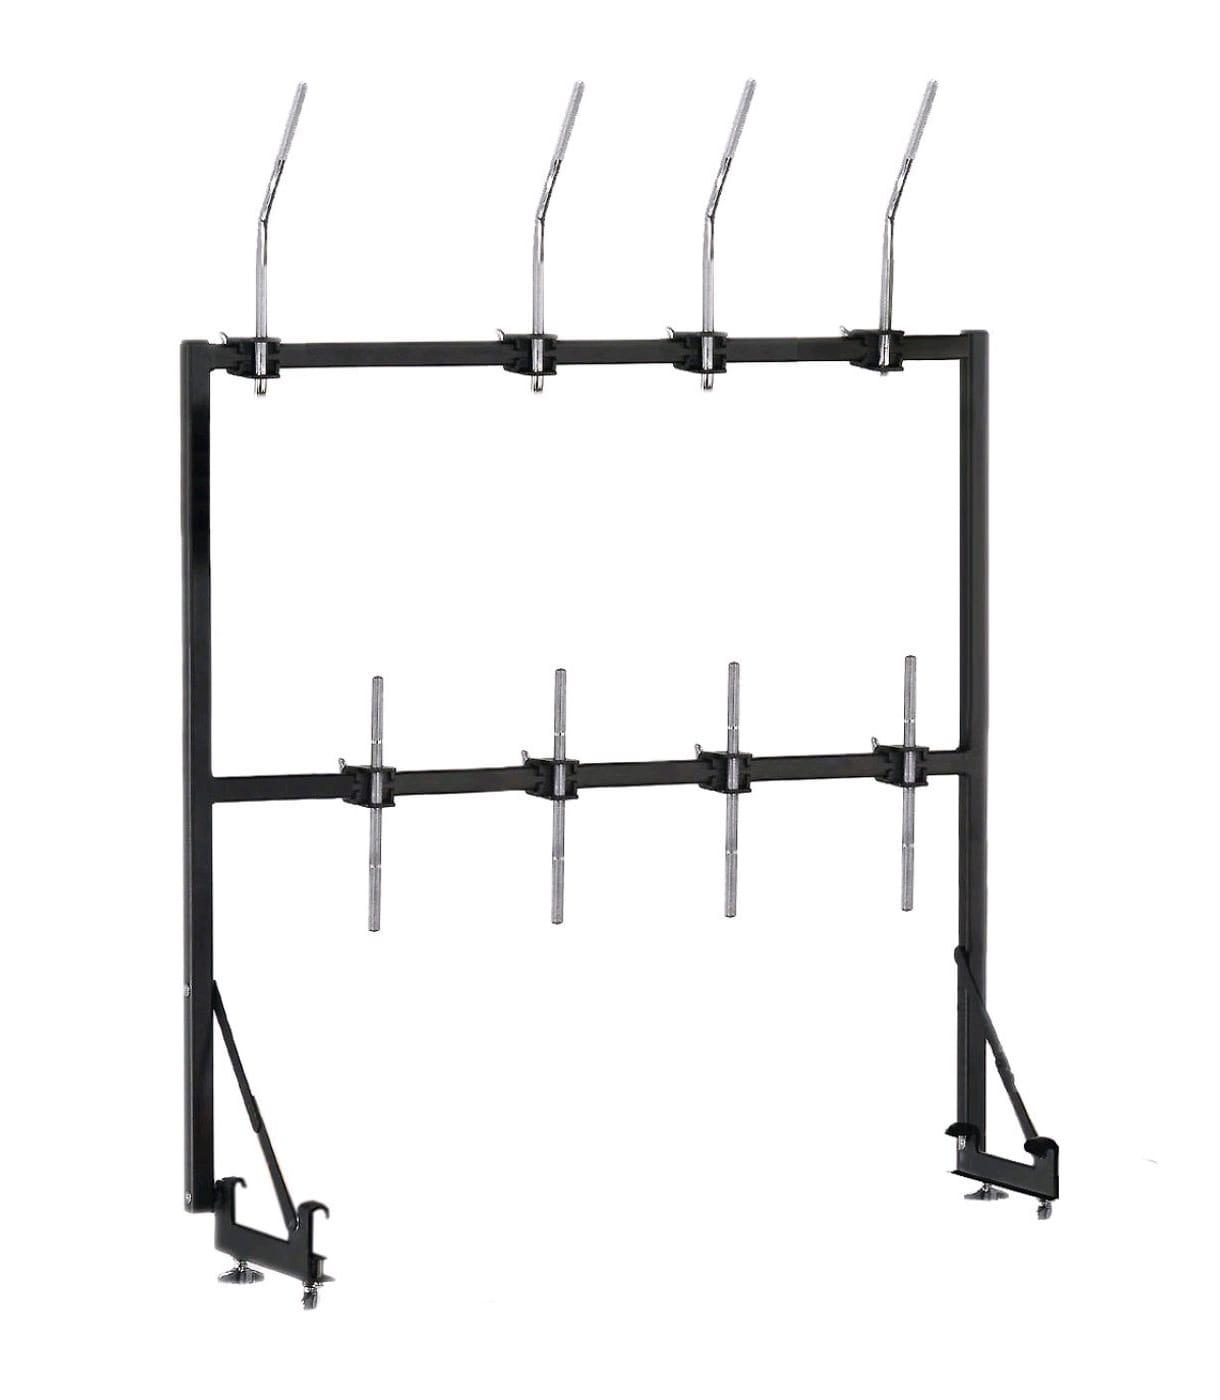 buy pearl ptr 1824 perc rack add on for ptt1824 w stabilizer